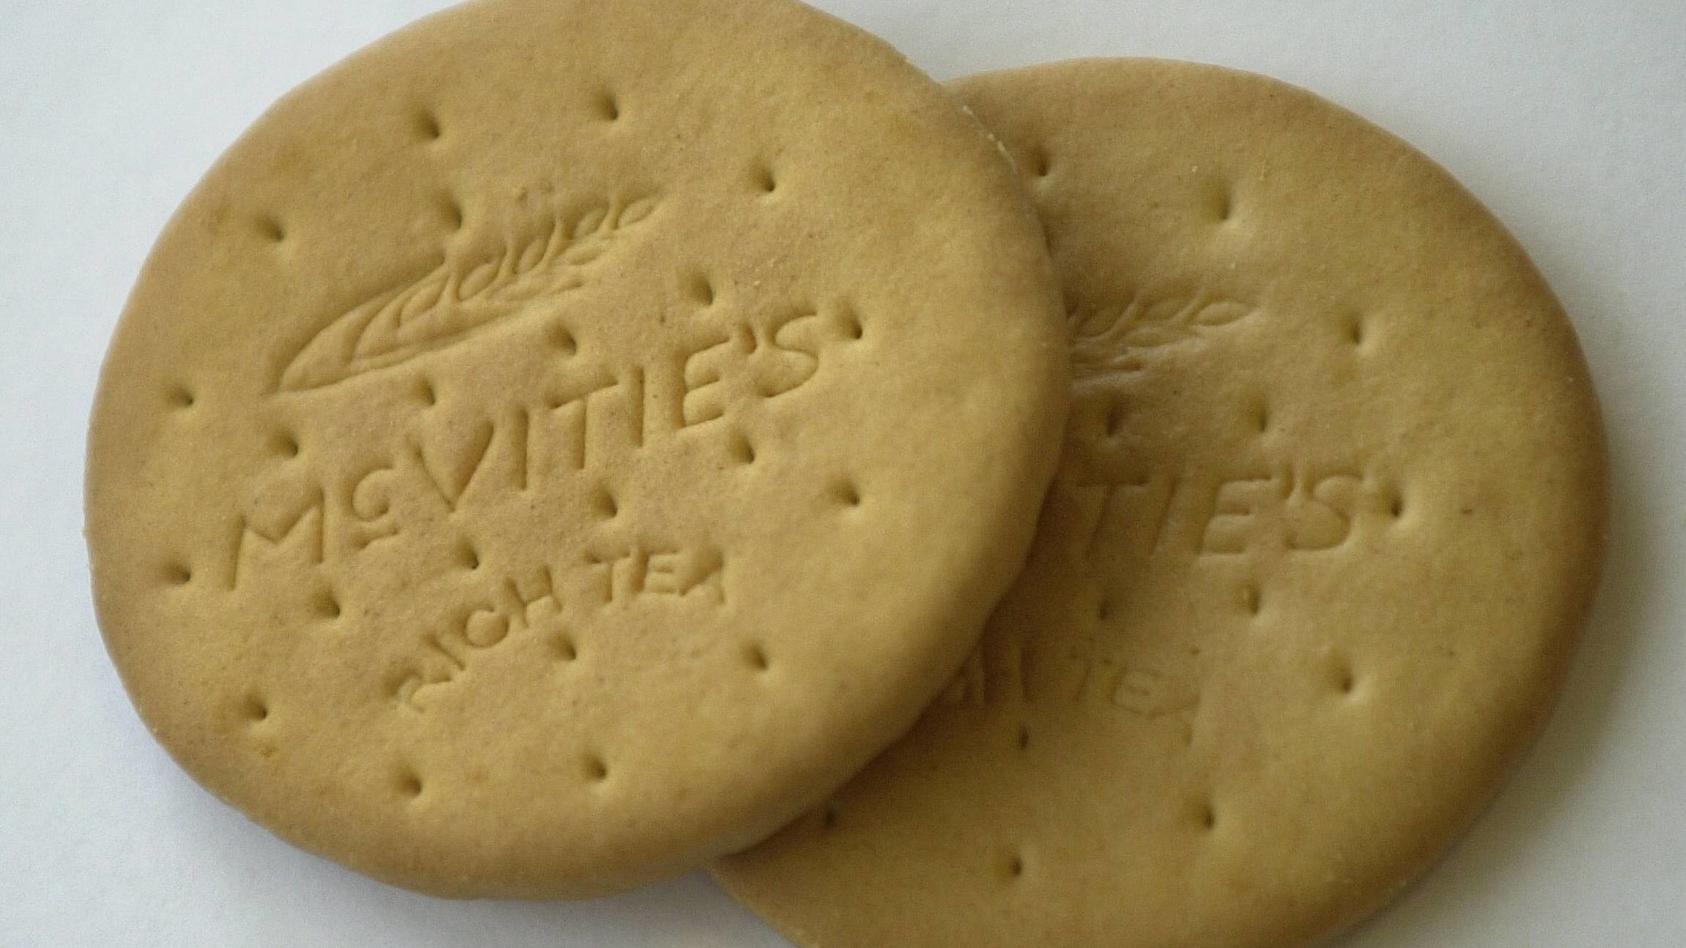 Helfen diese Kekse gegen Blähungen?